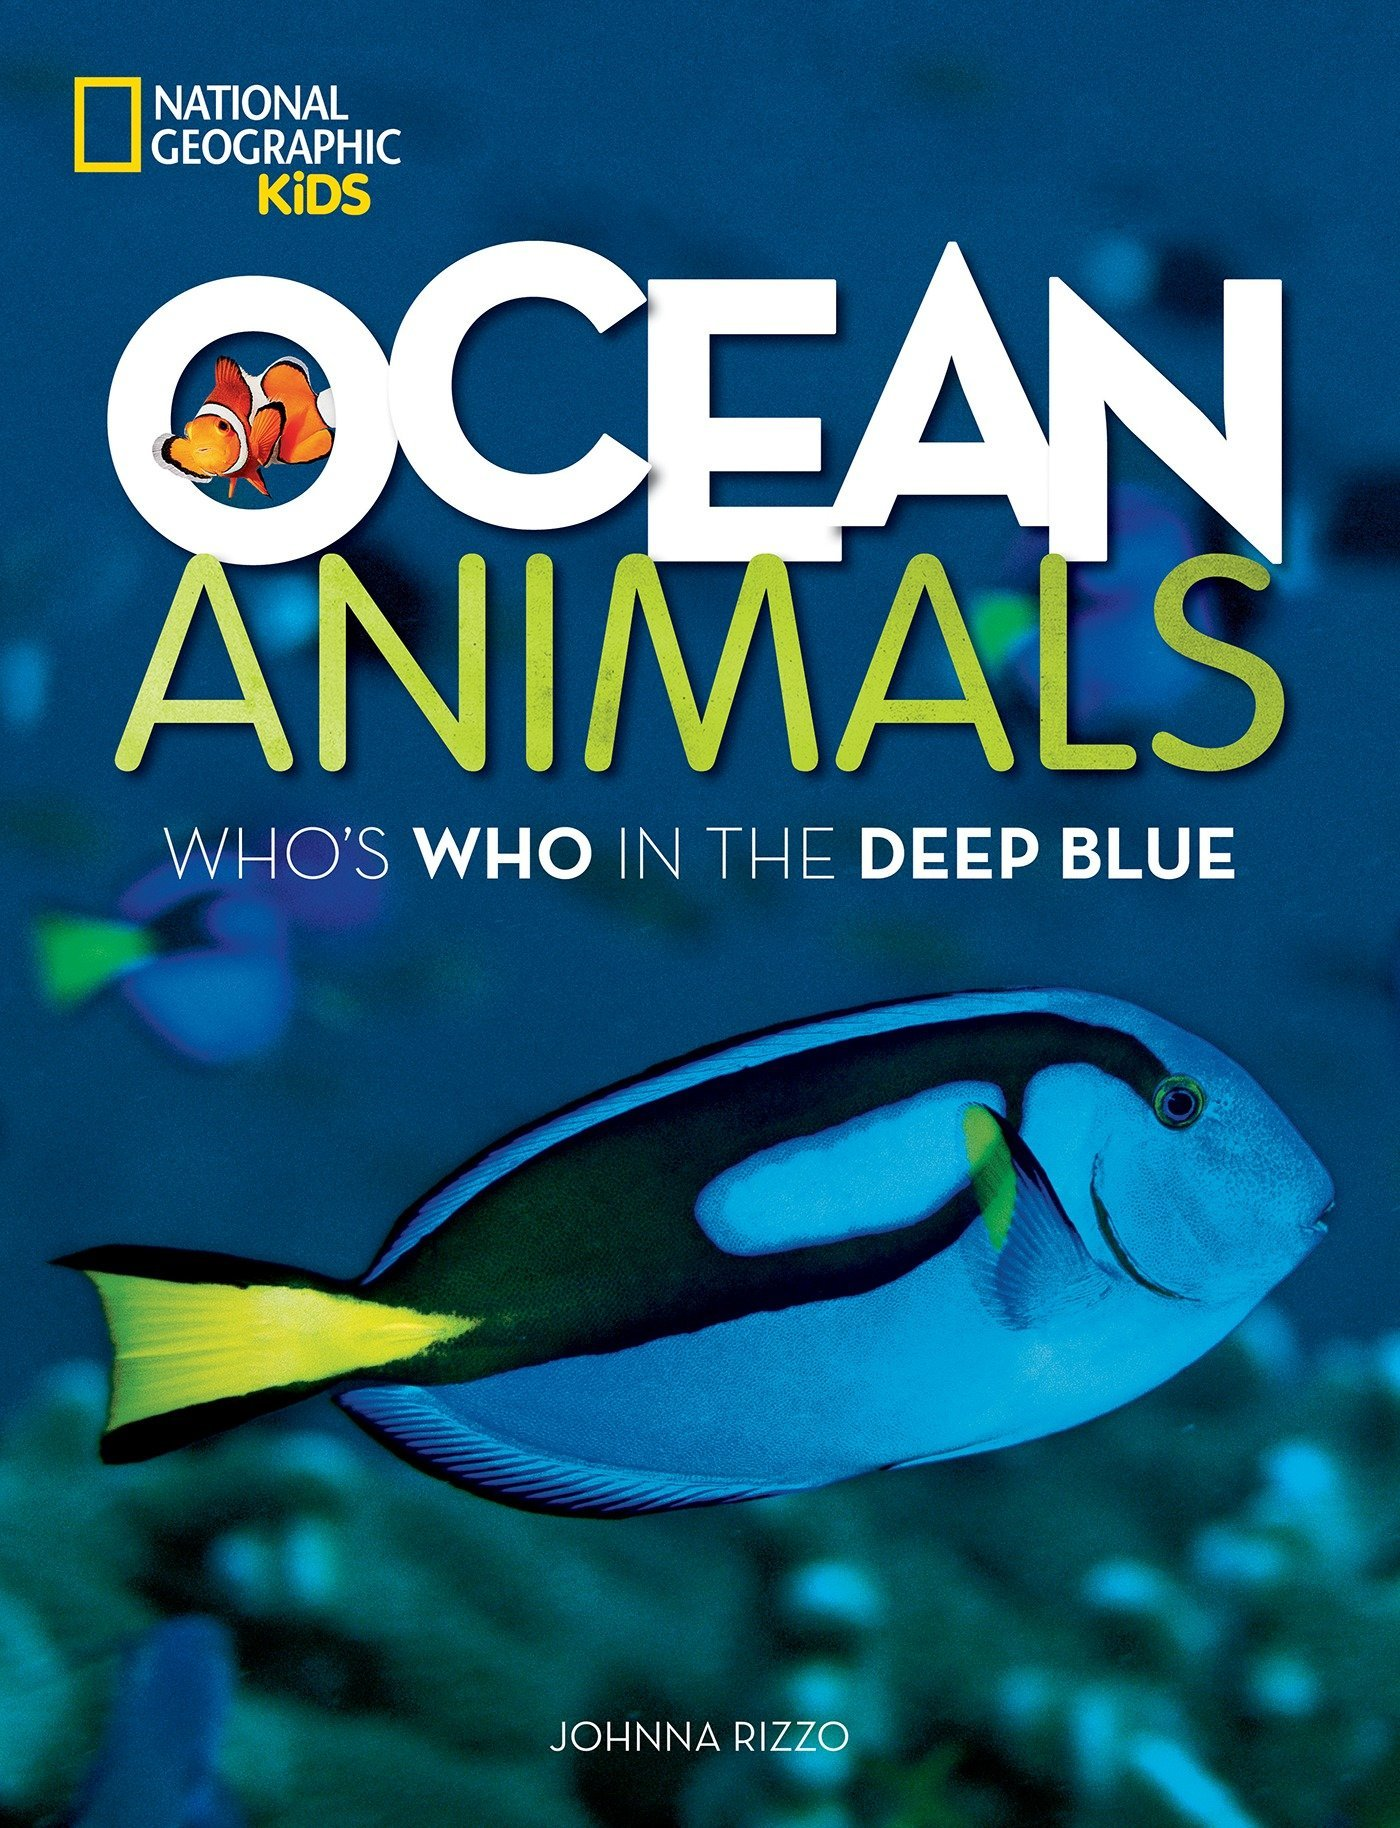 Deep Blue Sea Ocean Critters Jellyfish Squid  with chevron DogCat Tie Bandana